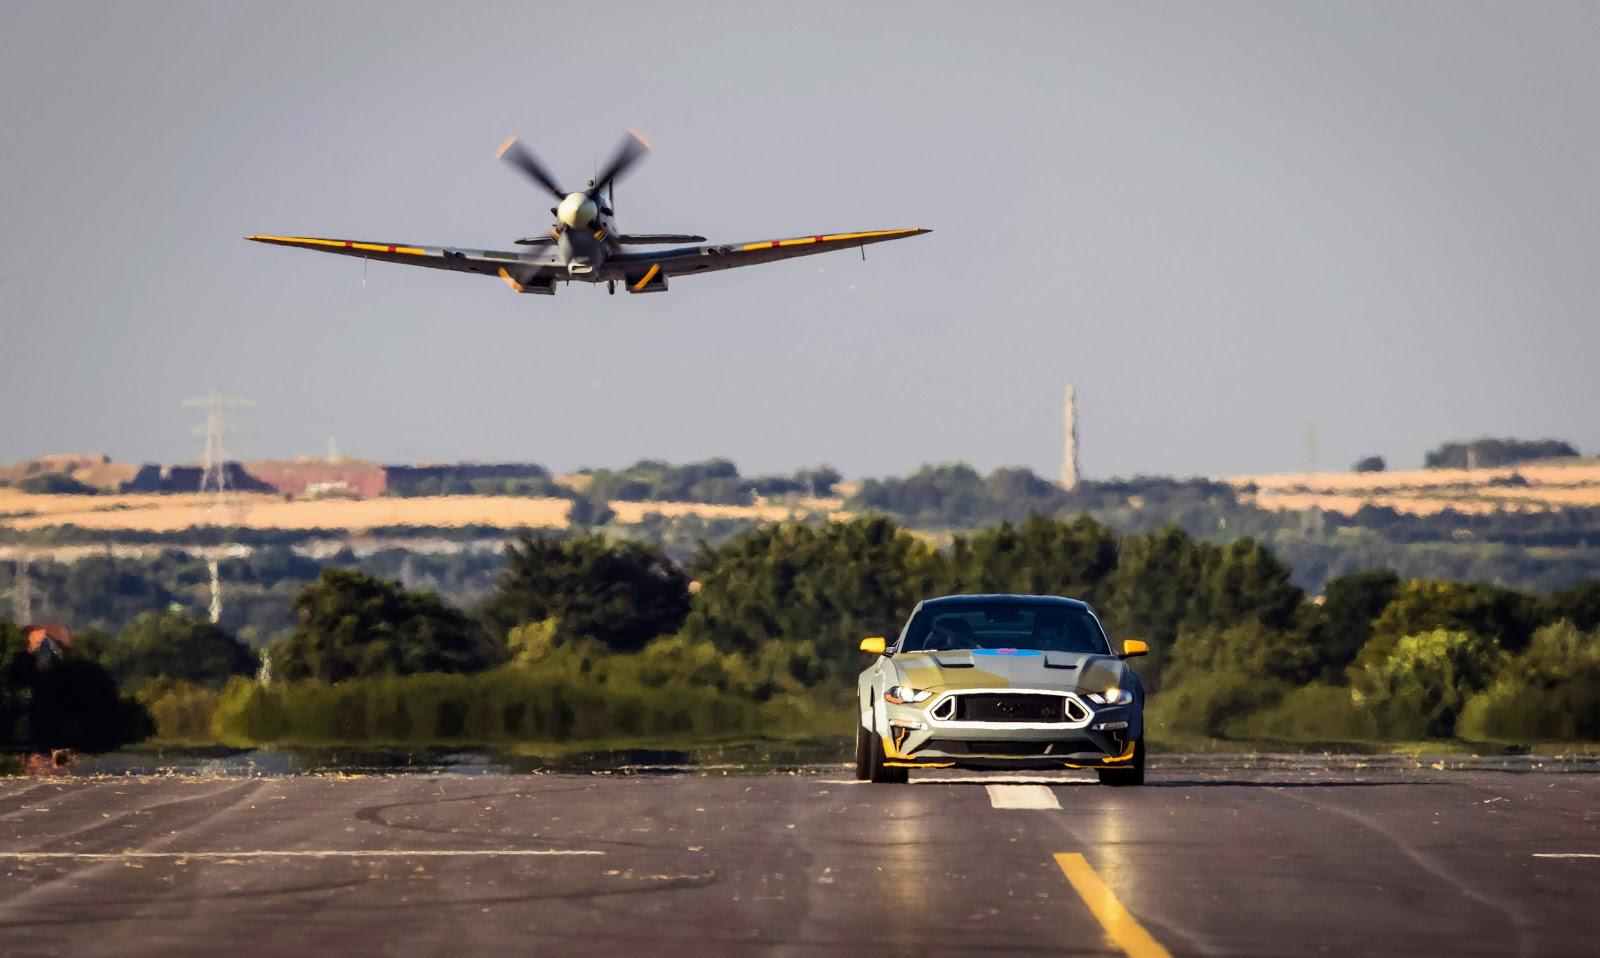 Eagle Mustang Raises 420000 At Charity Auction Theautoeu